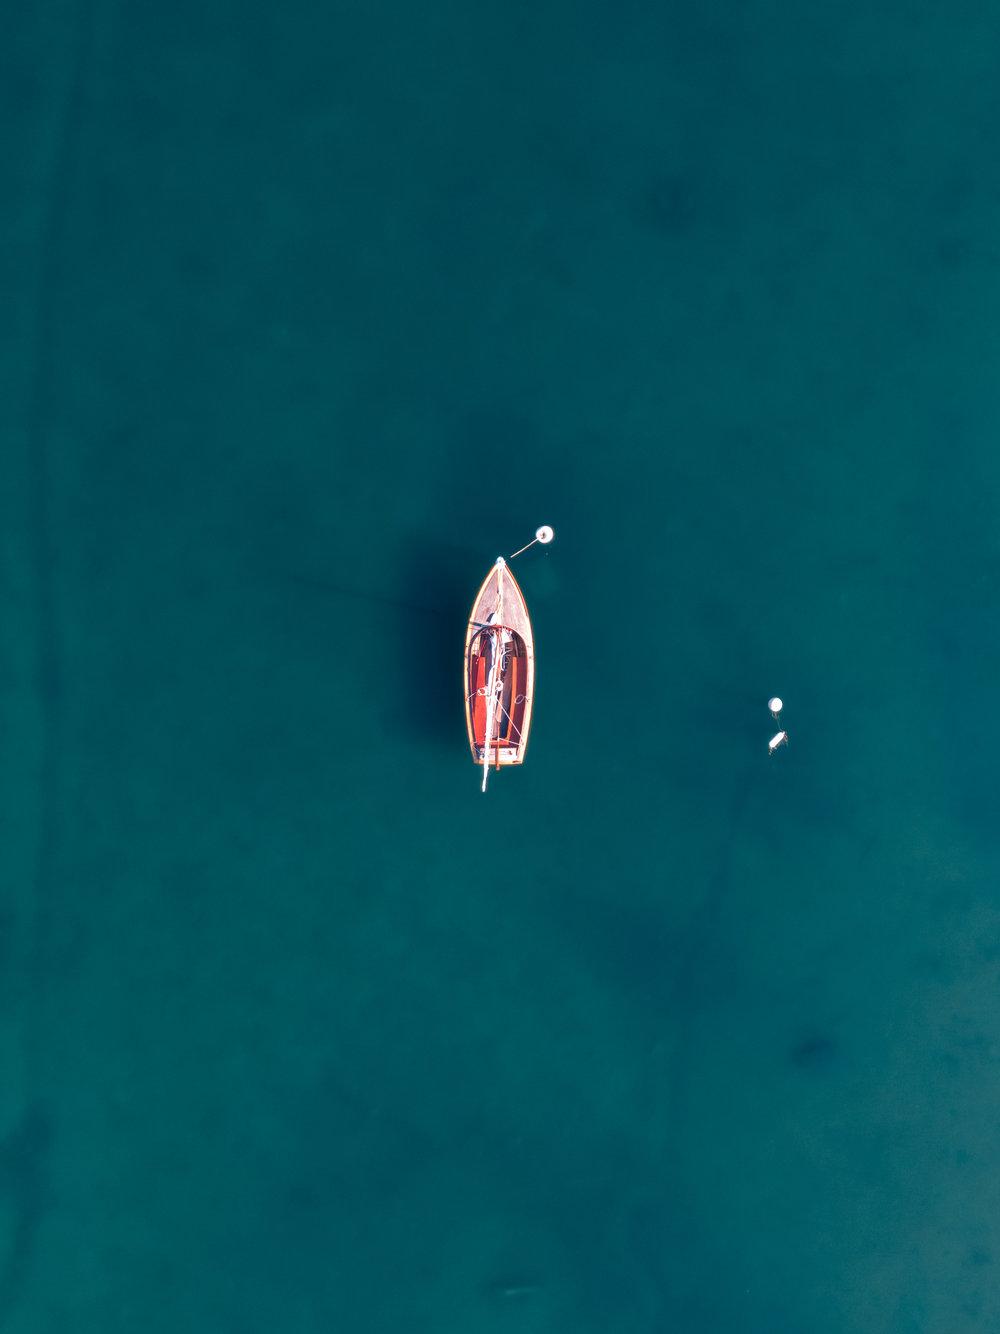 sailboat_typoland_aerial.jpg